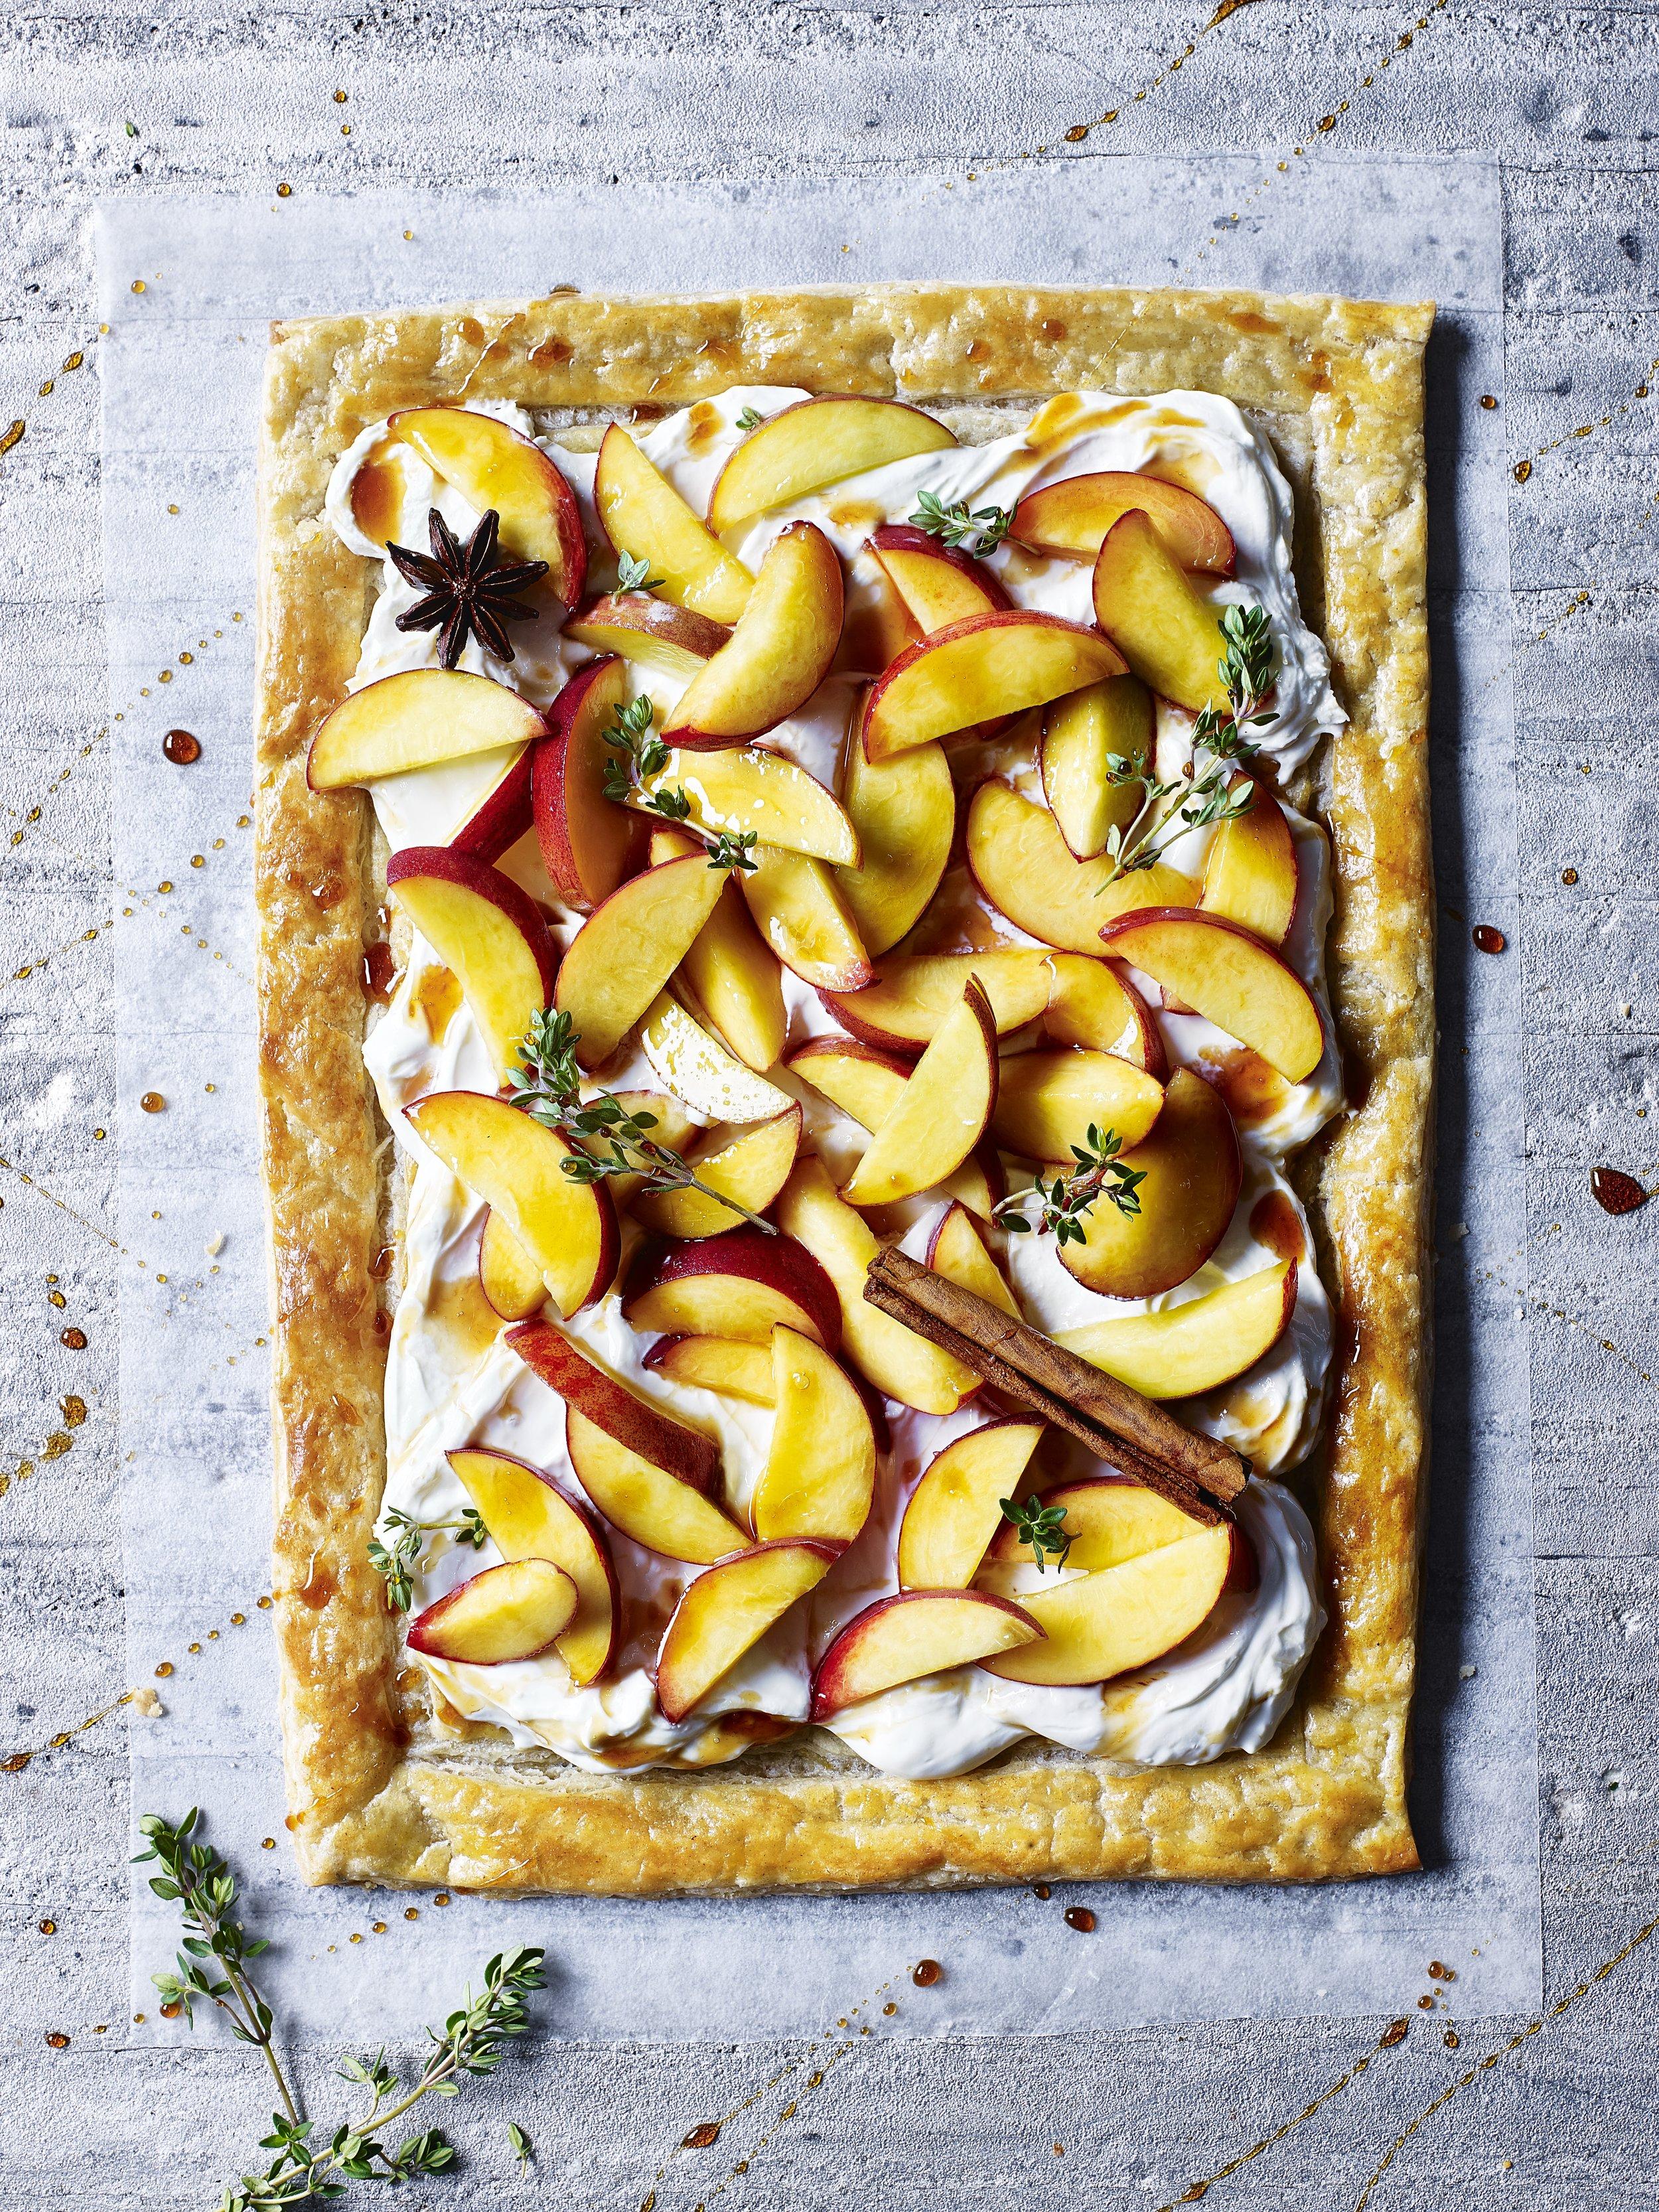 Peach and mascarpone tart